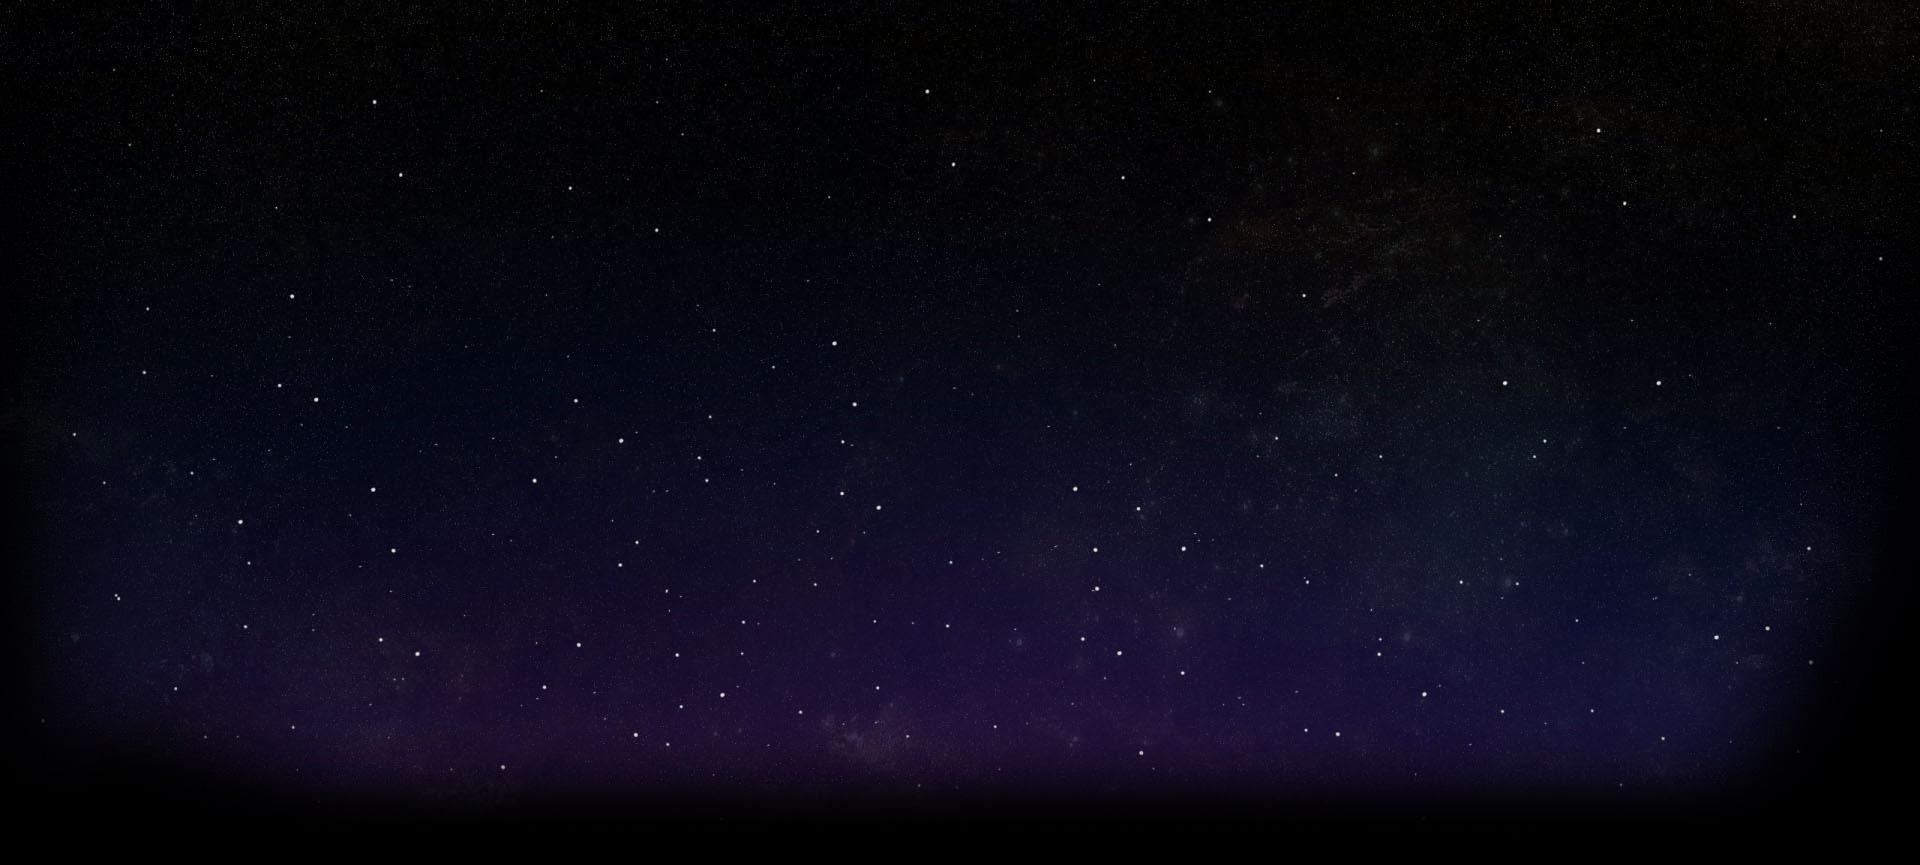 steam コミュニティマーケット 552980 night sky の注文